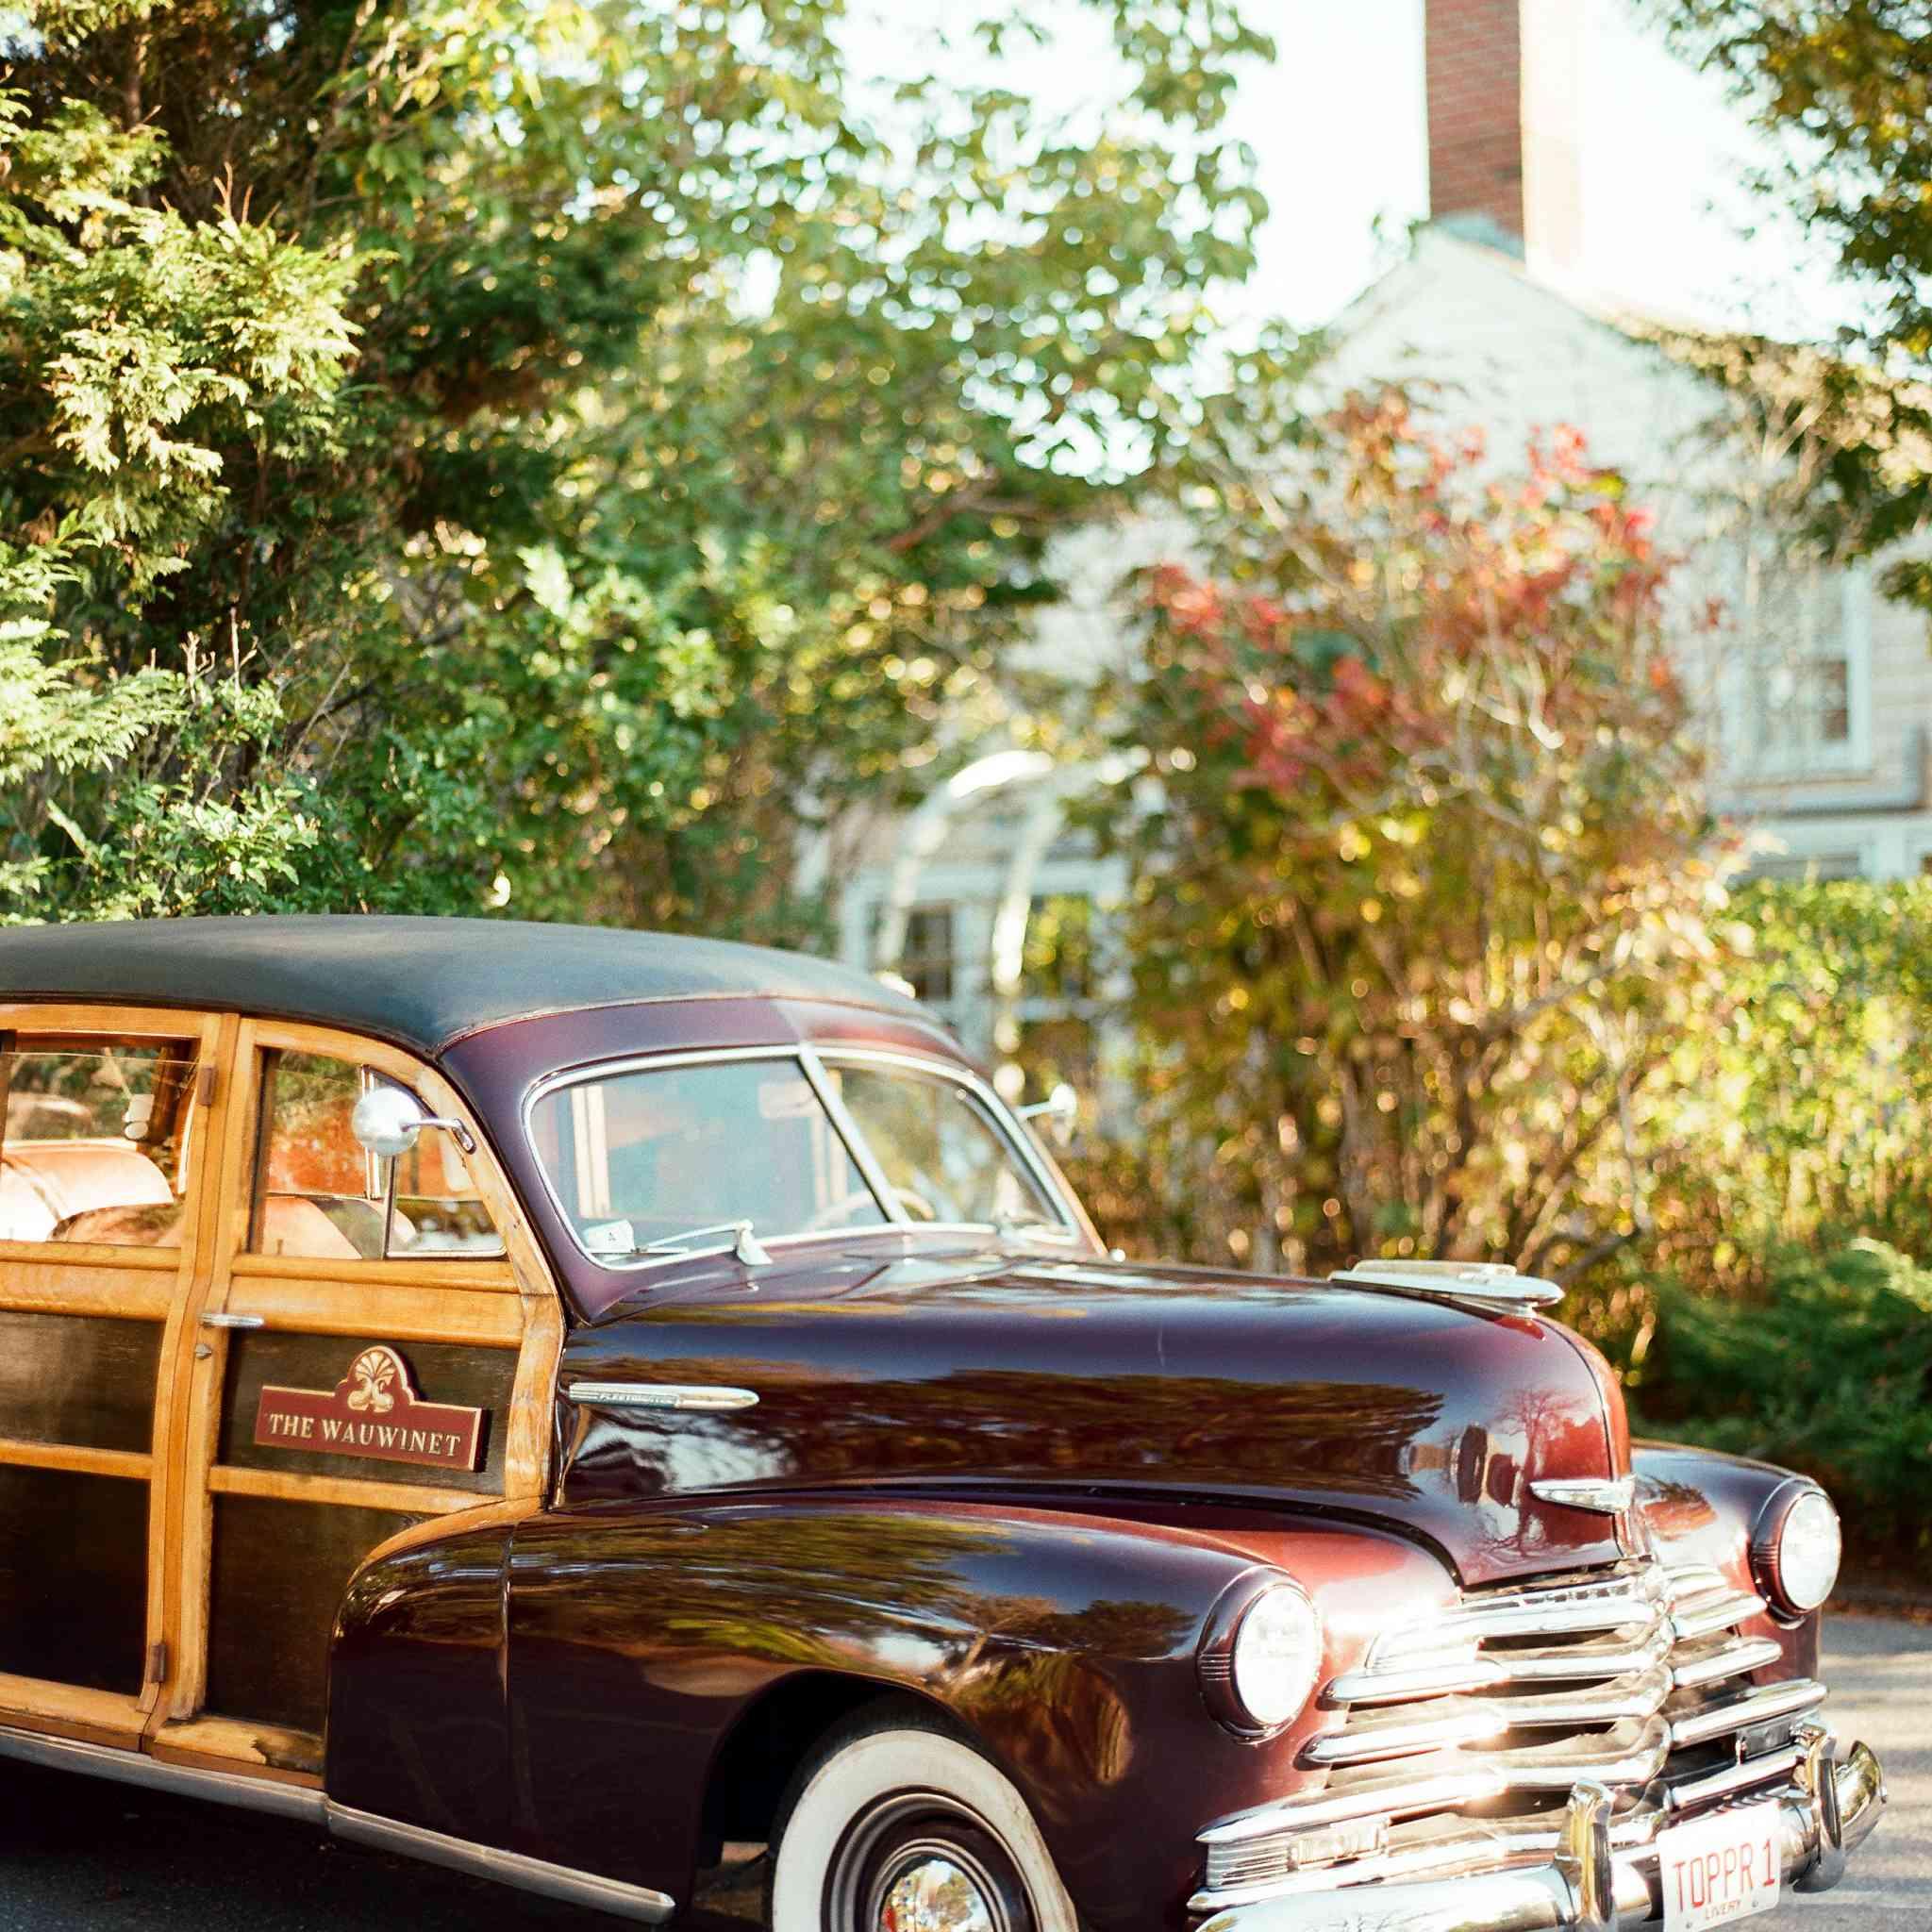 <p>wedding transportation classic car</p><br><br>